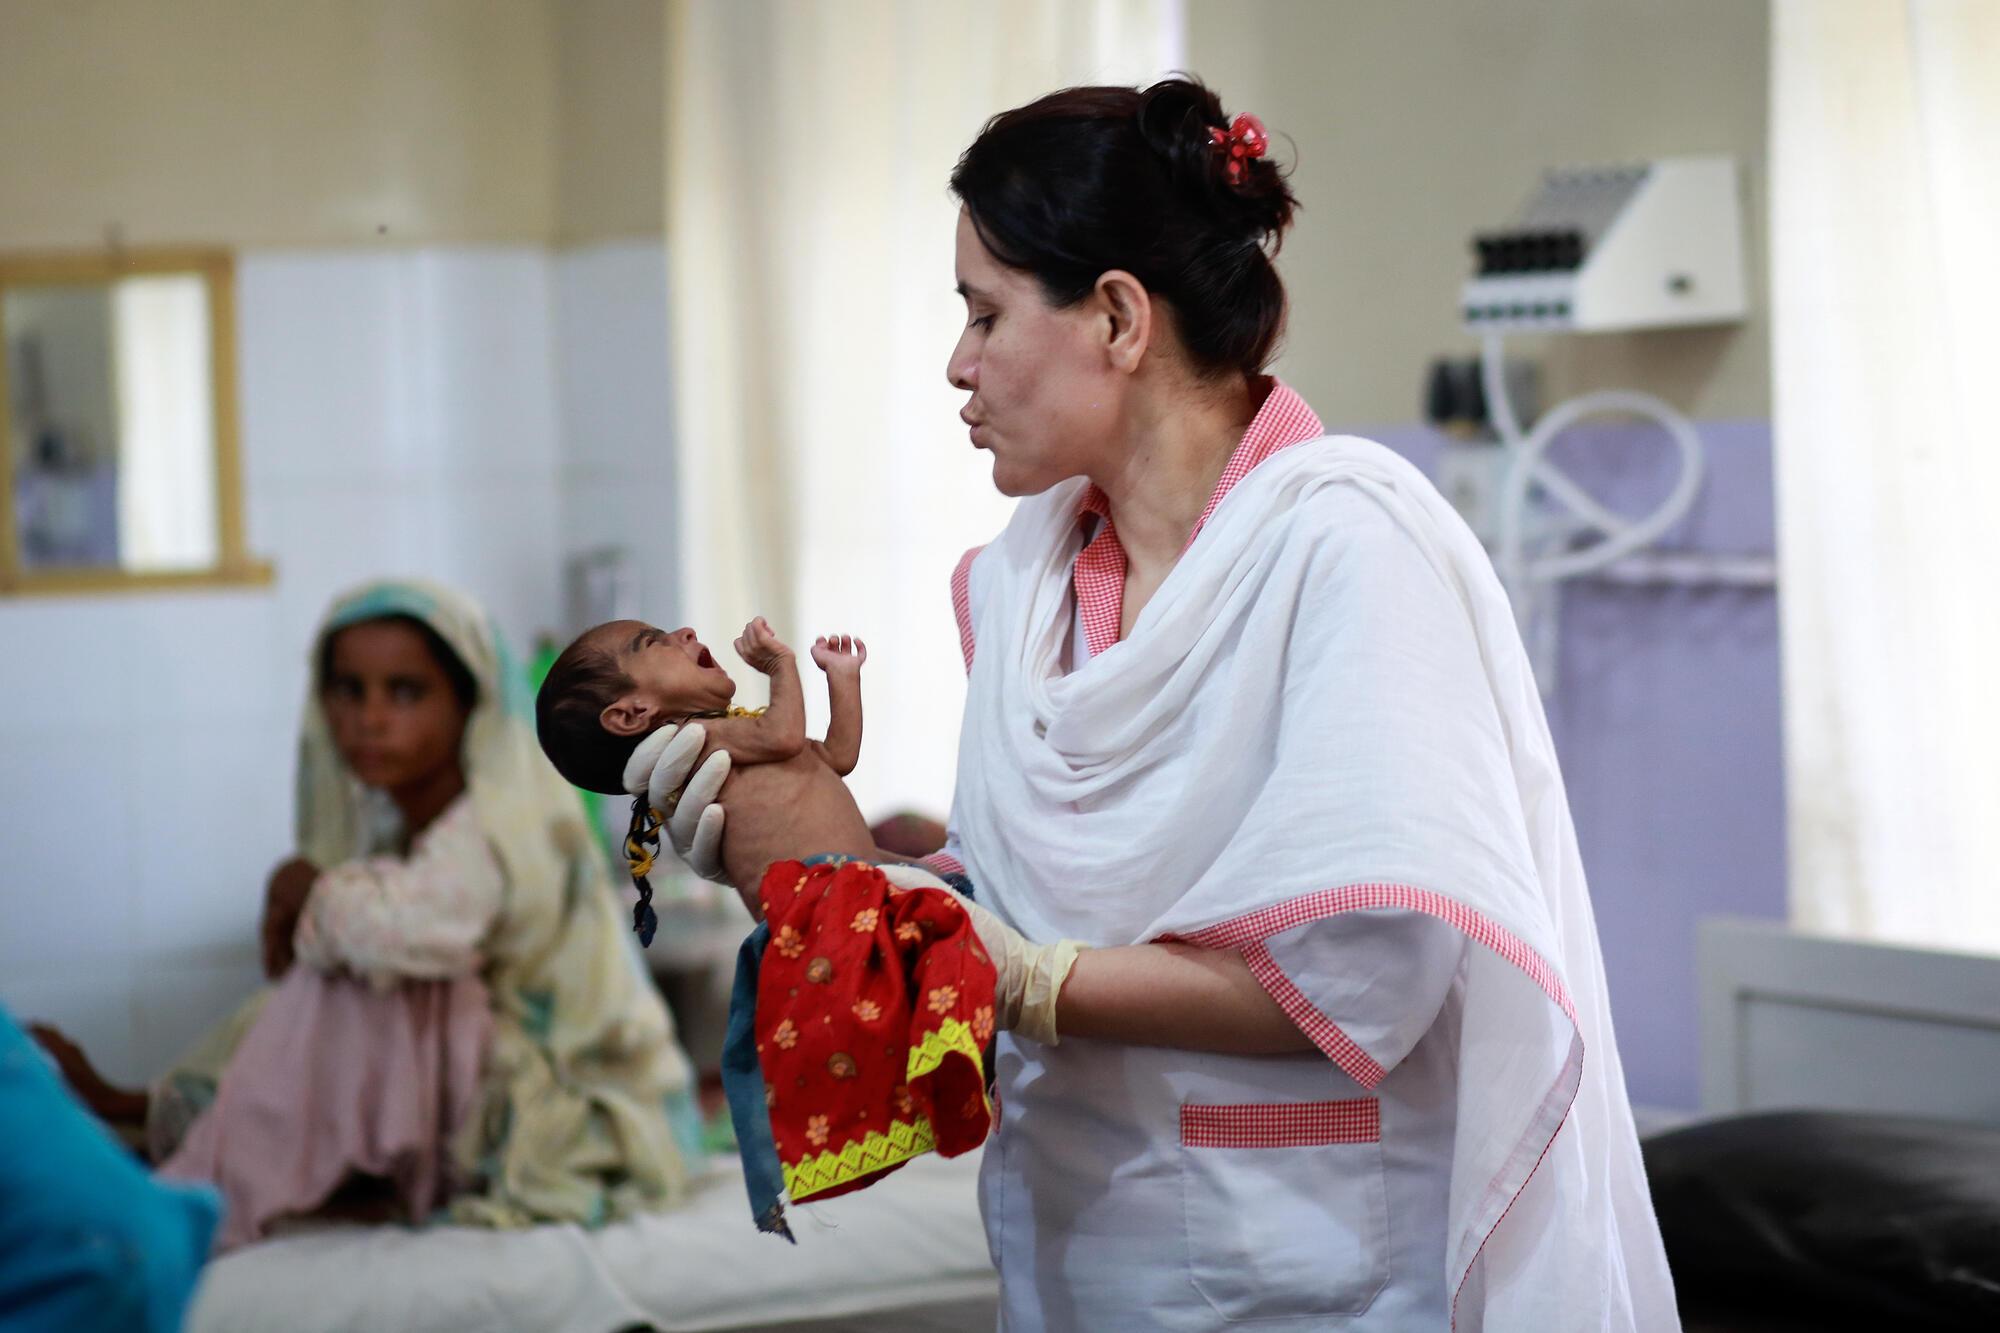 An MSF nurse calms a malnourished baby in Balochistan, Pakistan